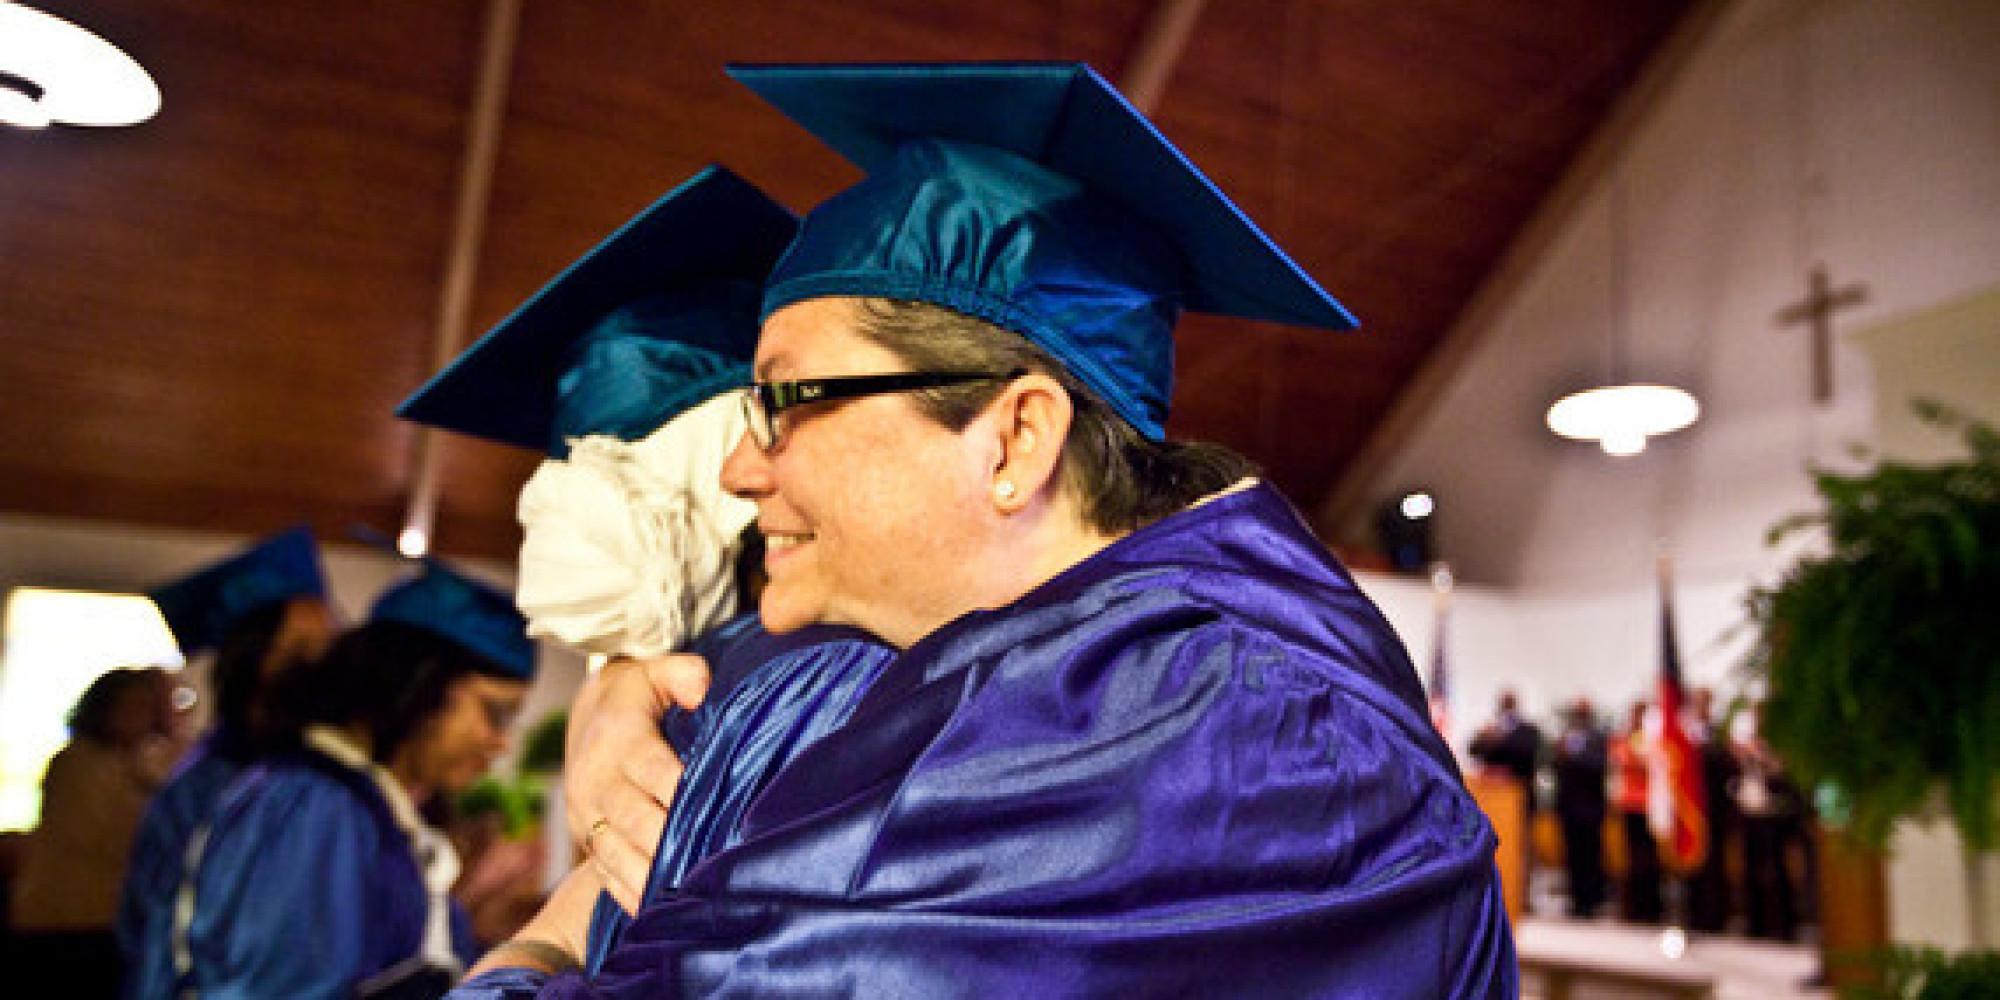 0102801-11AB Graduation ceremony at Arrendale State Prison